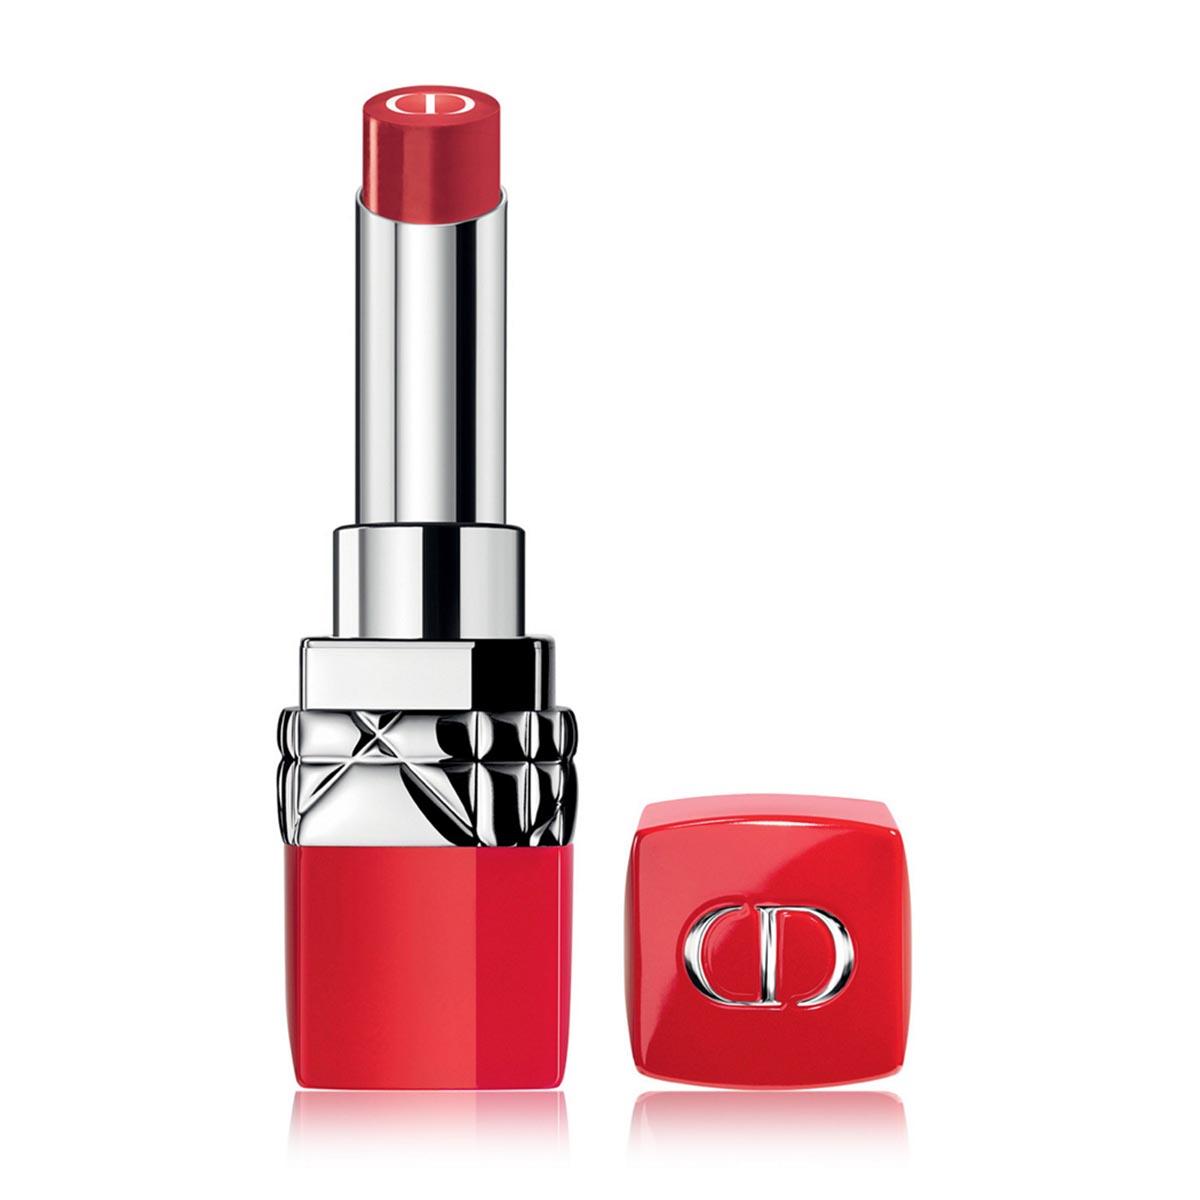 Dior rouge dior ultra care lipstick 635 ecstase